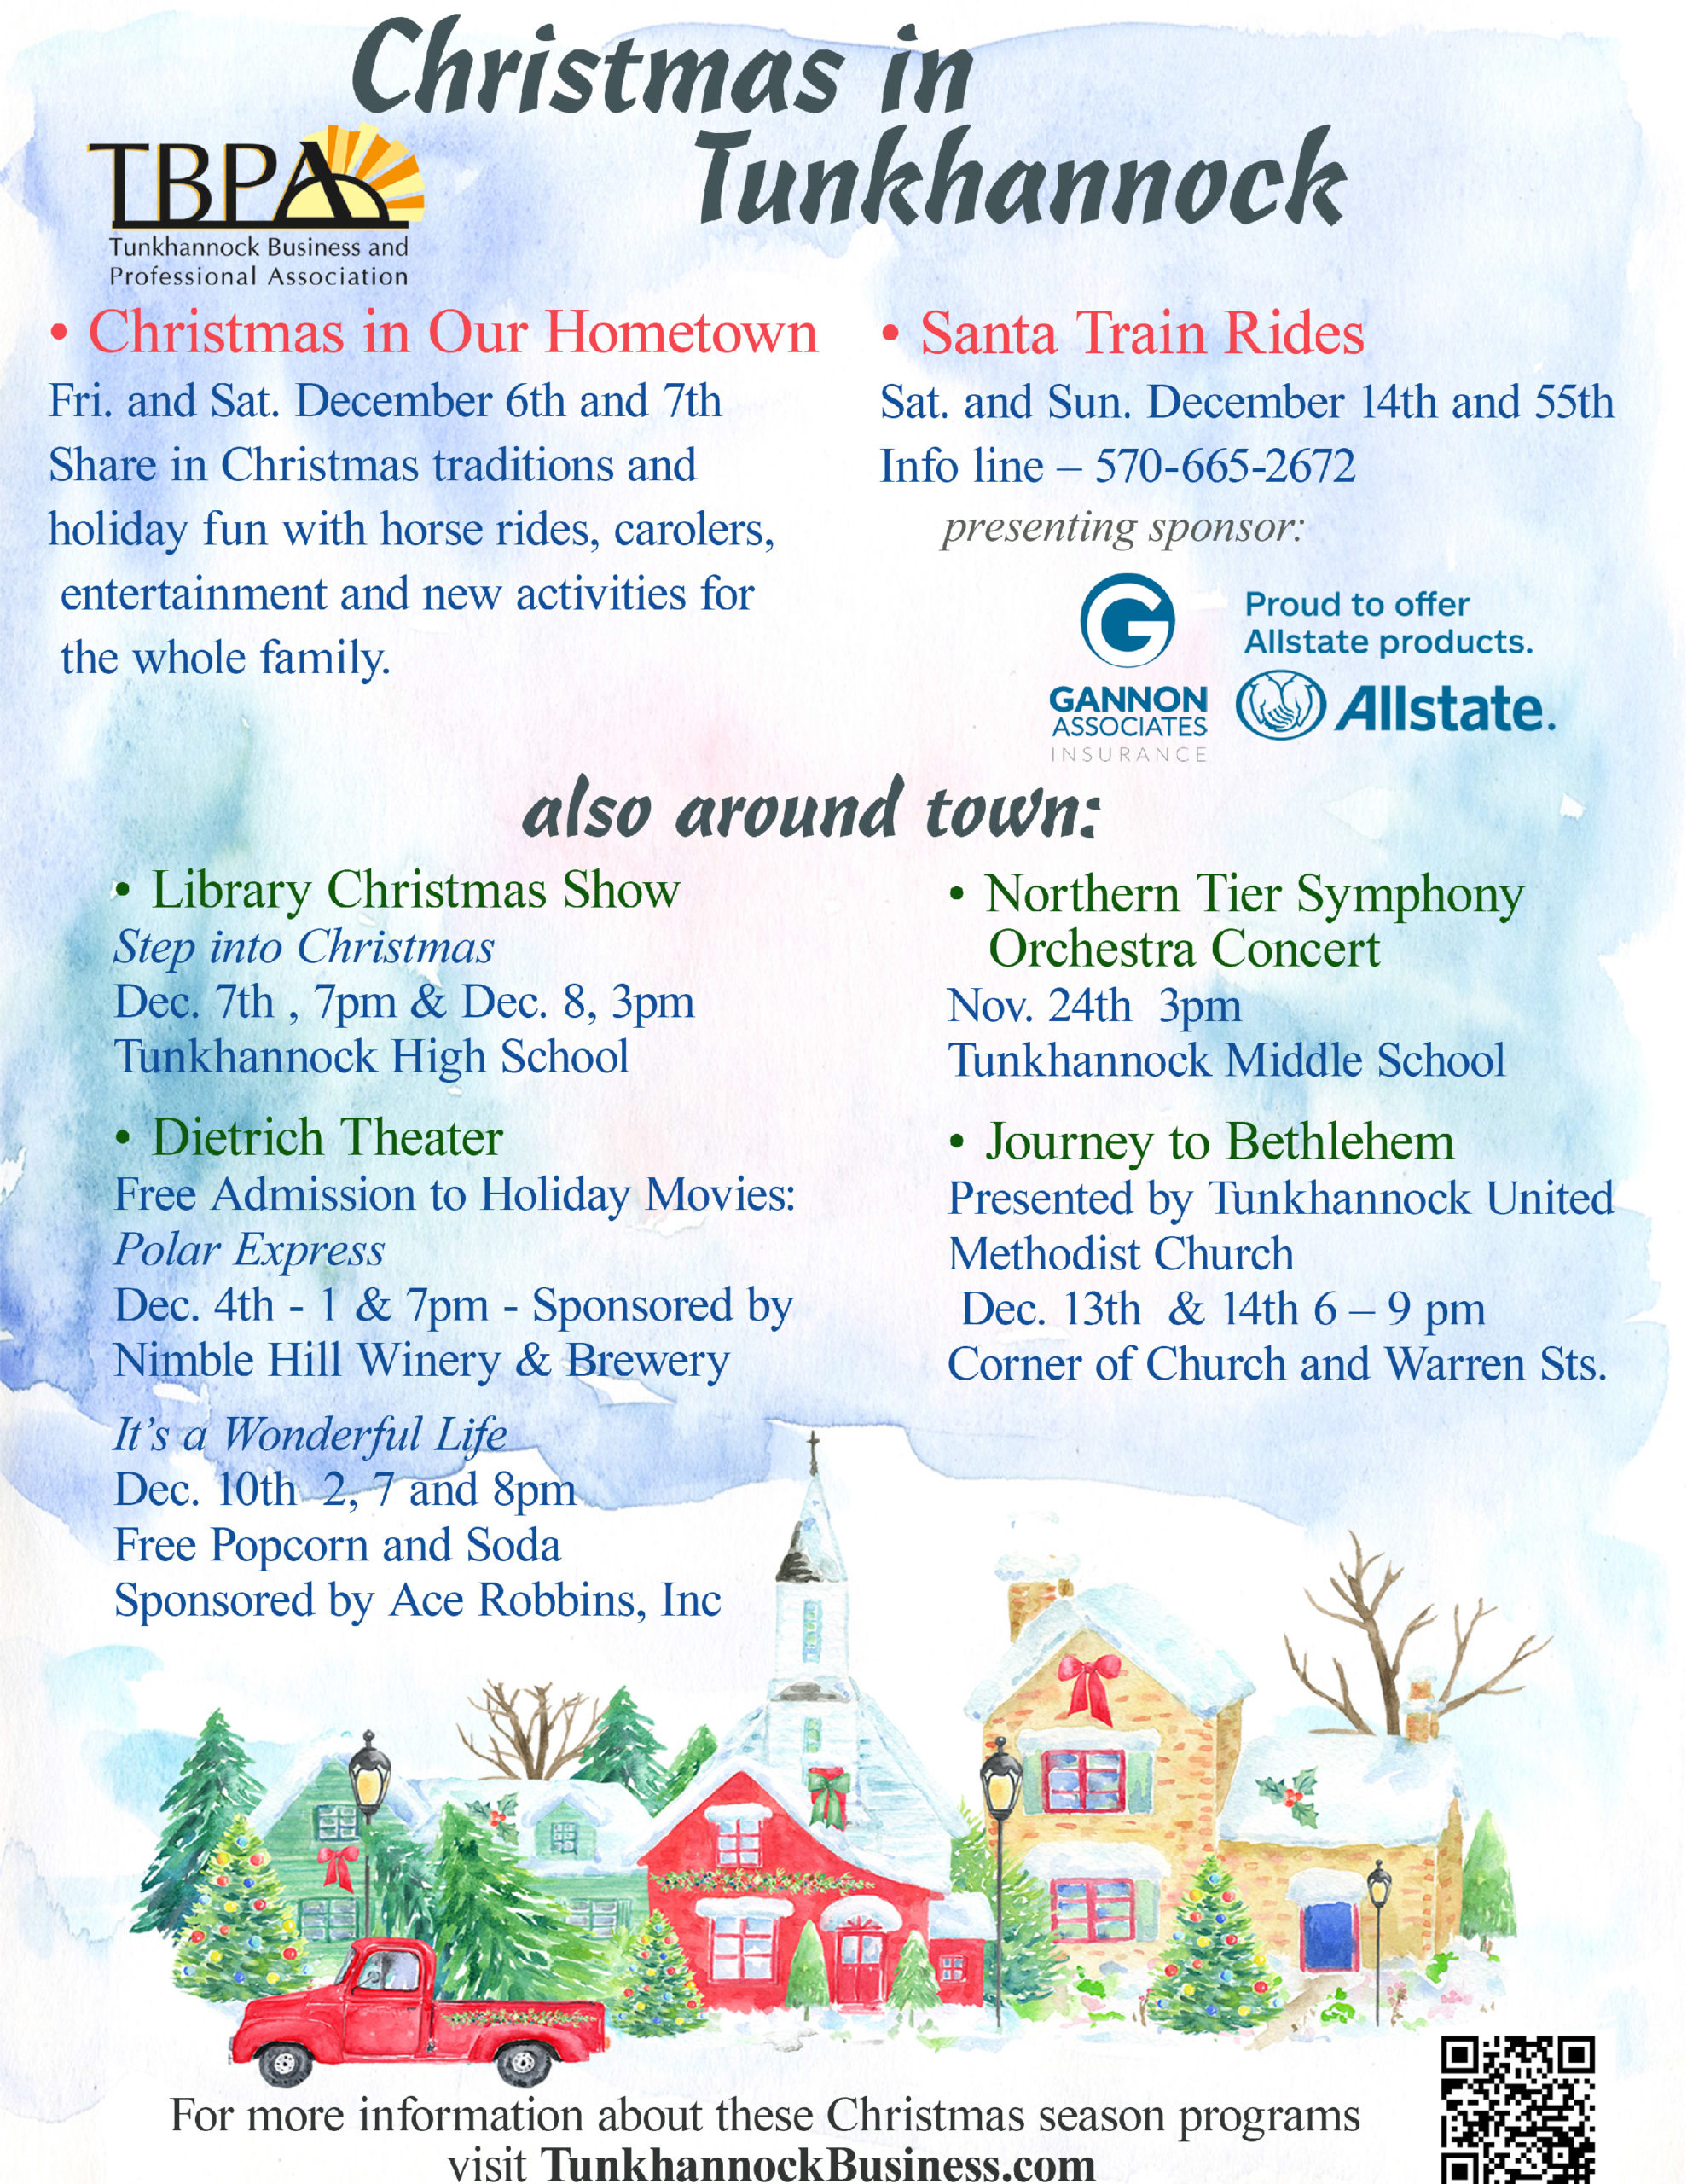 Christmas In My Hometown Tunkhannock Pa 2020 Christmas In Our Hometown   Tunkhannock Business & Professional